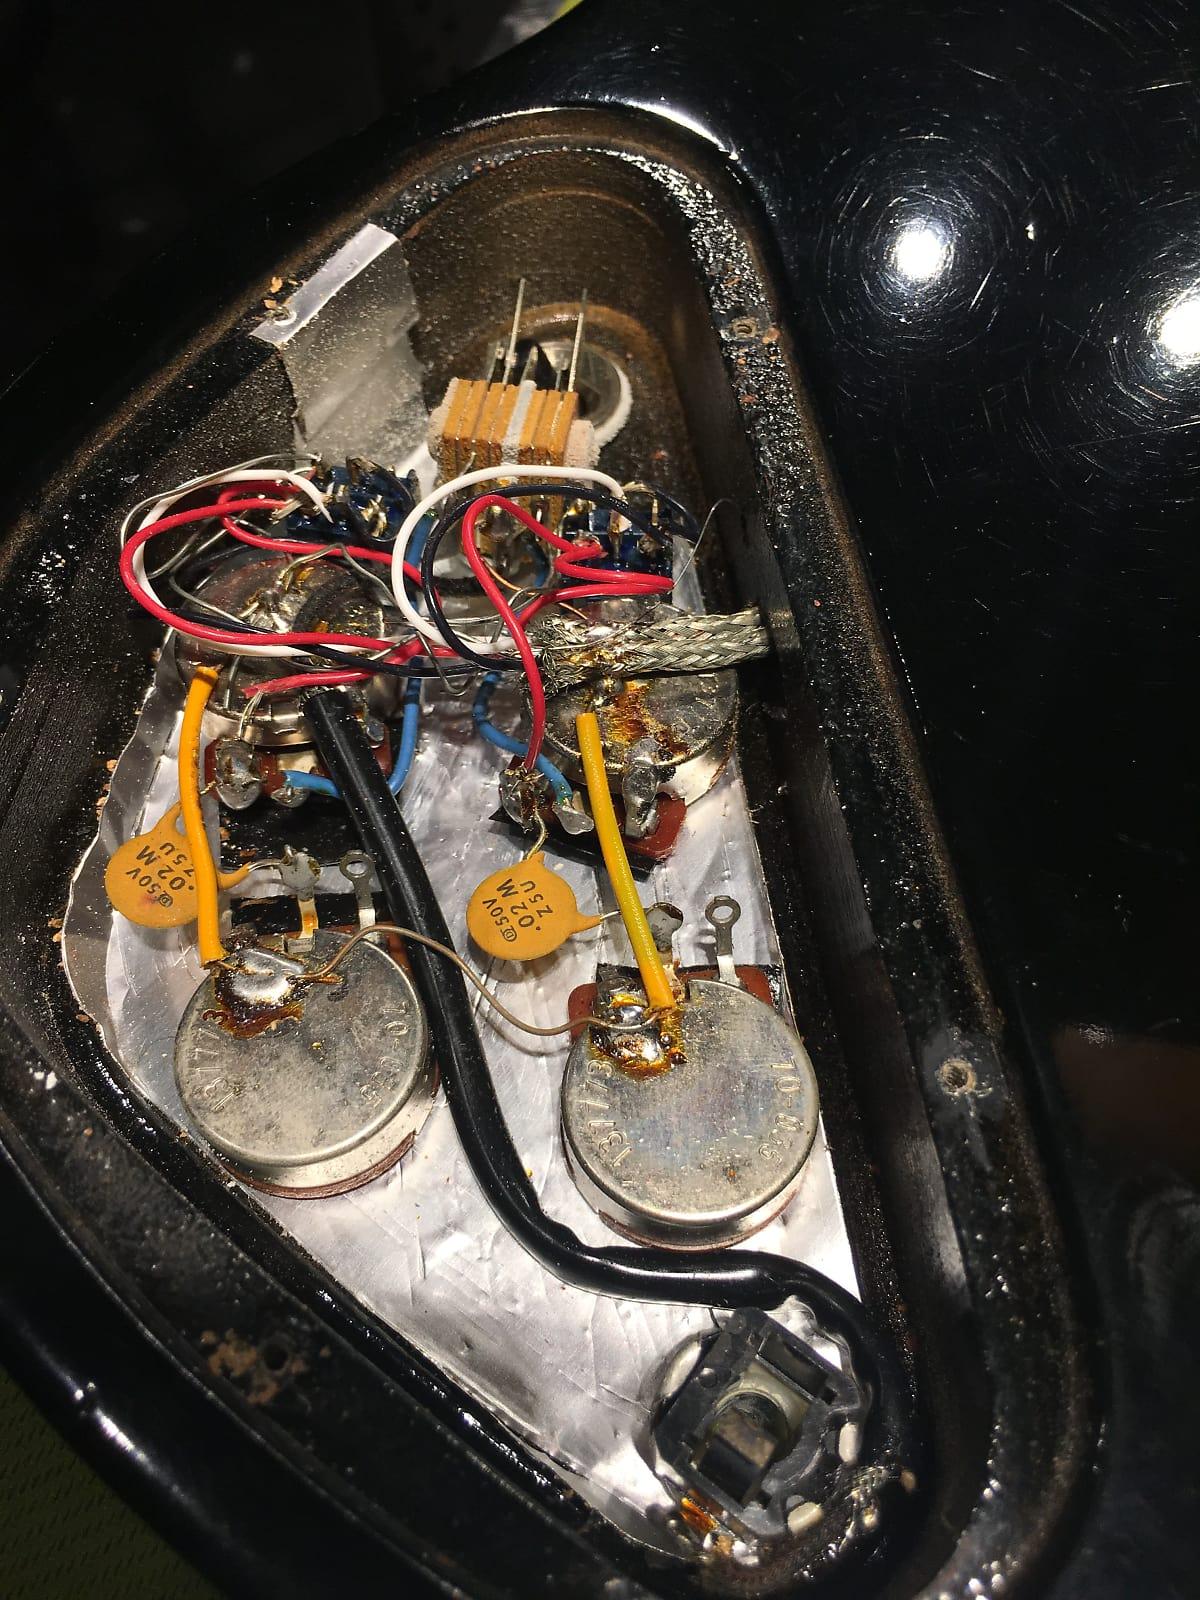 Gibson Sg Special Black 1977 S157 Dimarzio Super Distortion Hot Wire Wiring 1495